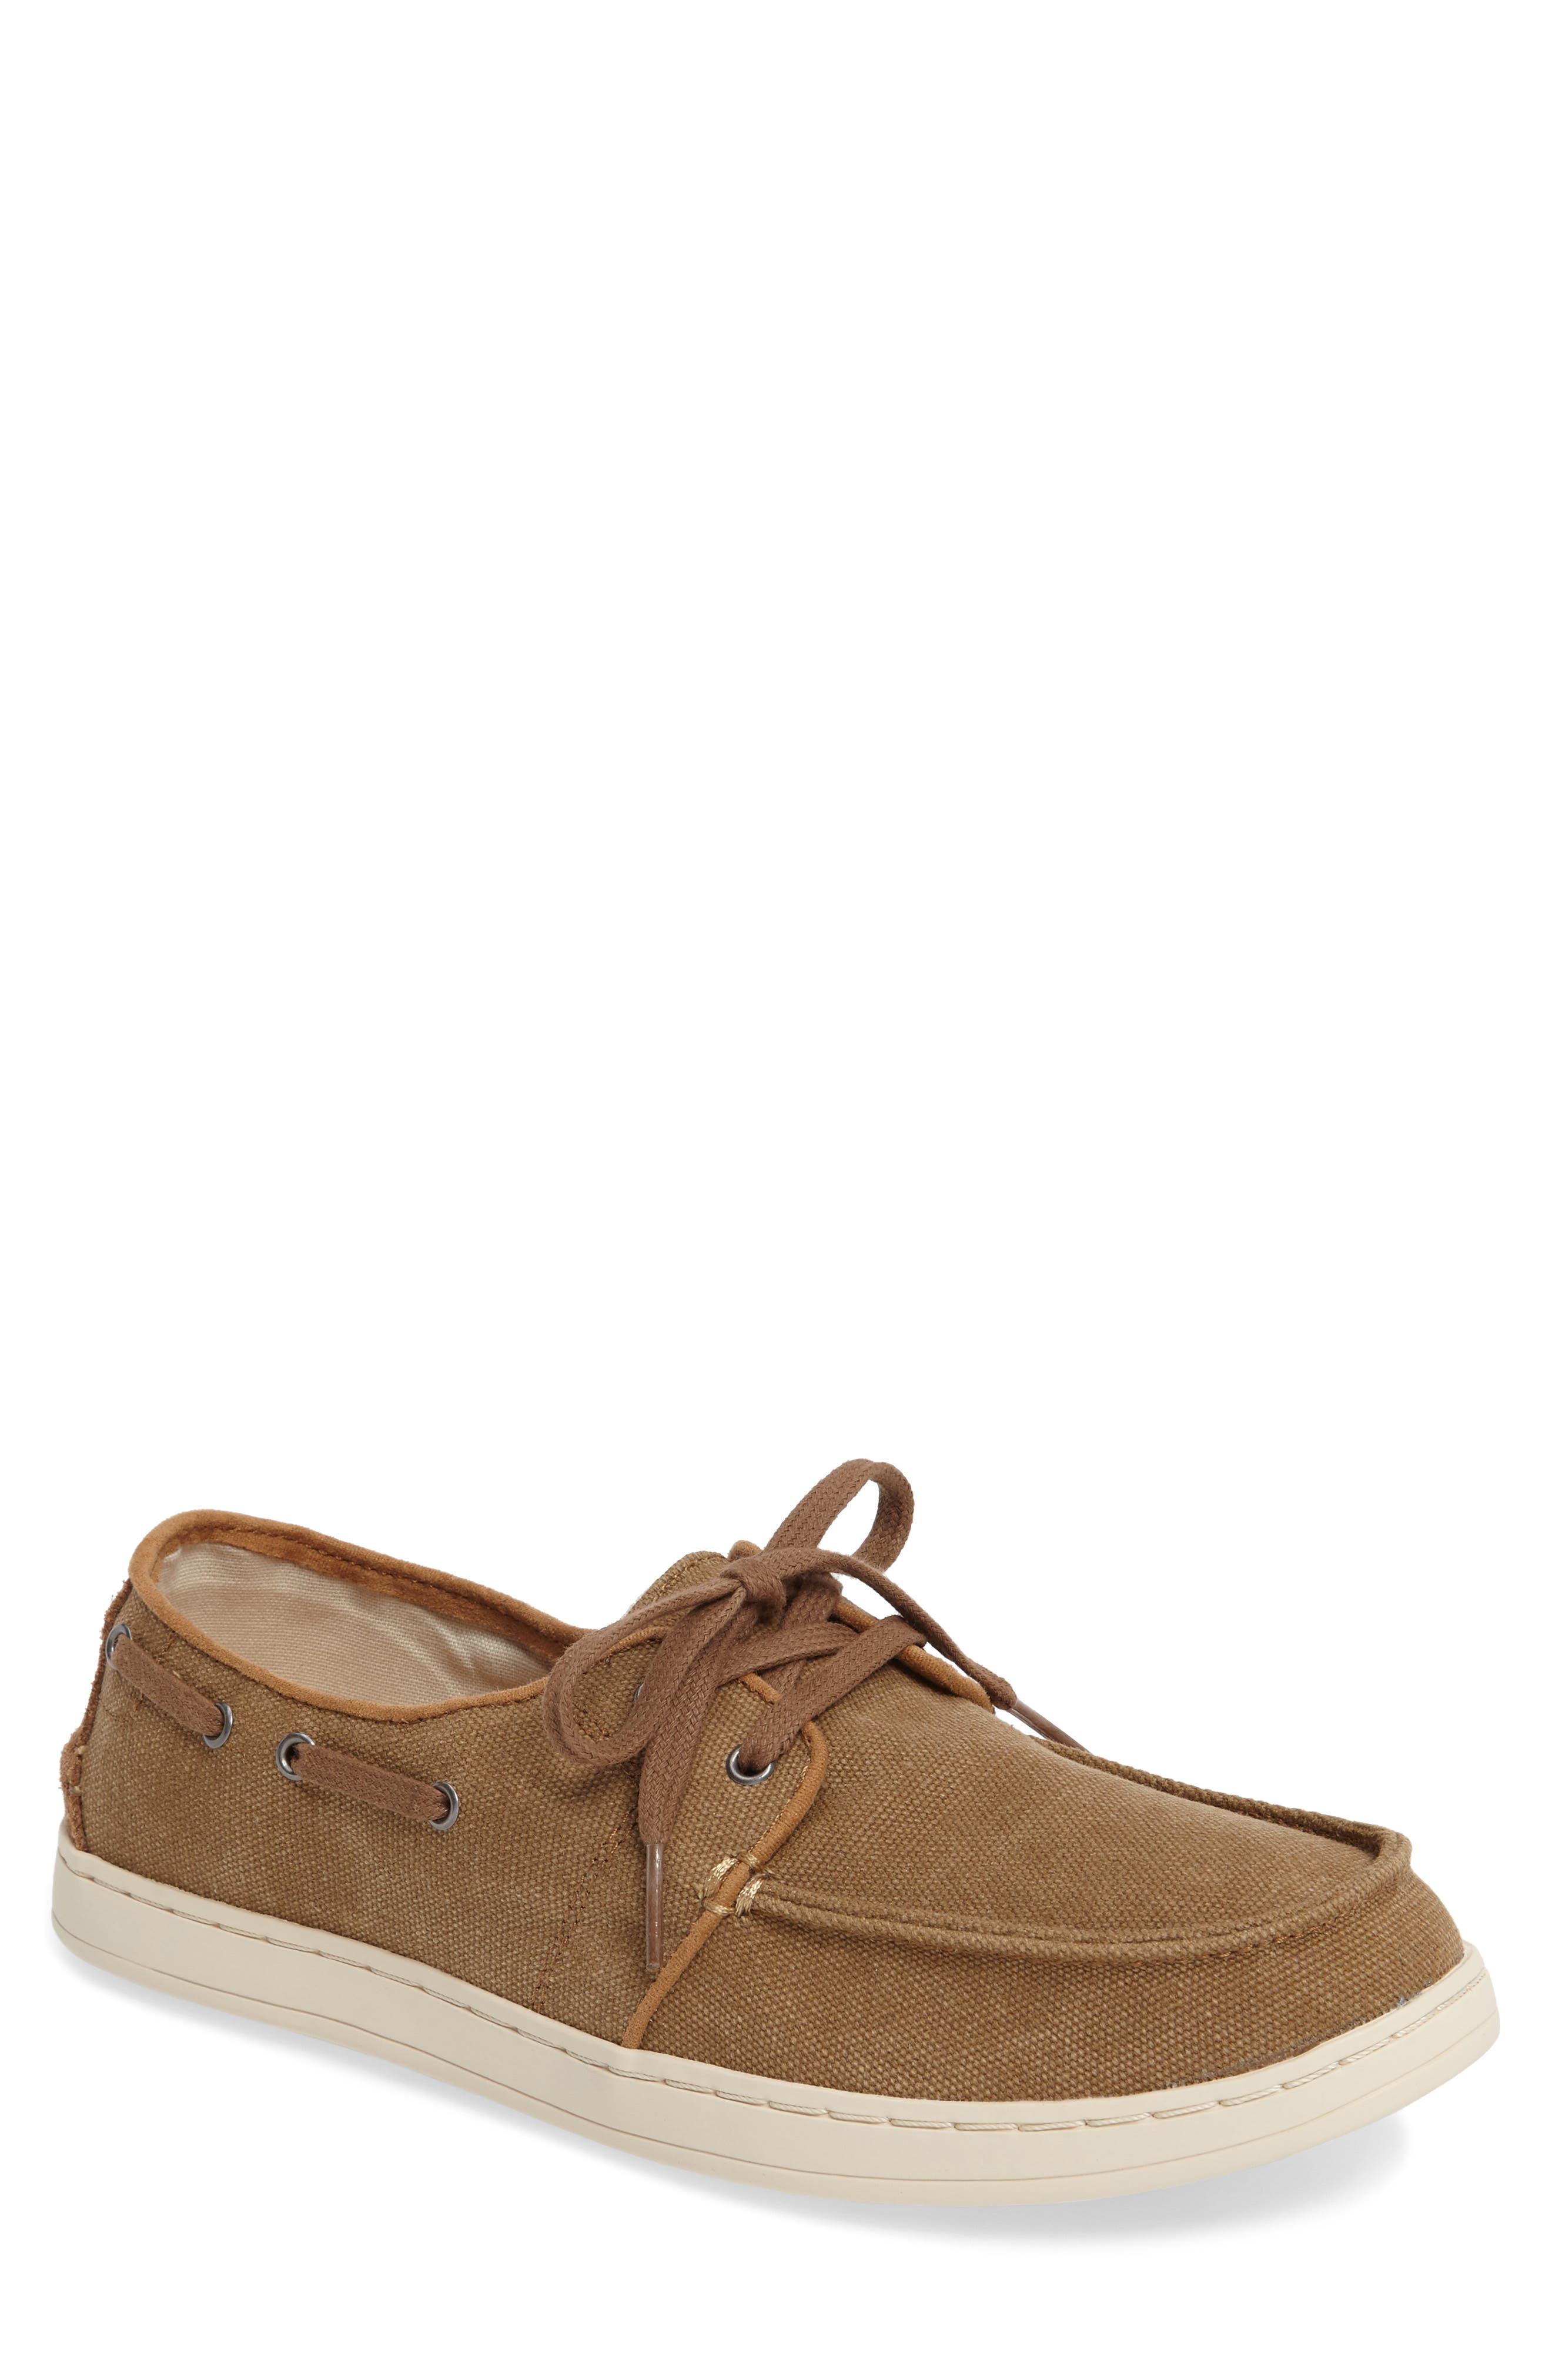 Main Image - TOMS 'Culver' Boat Shoe (Men)